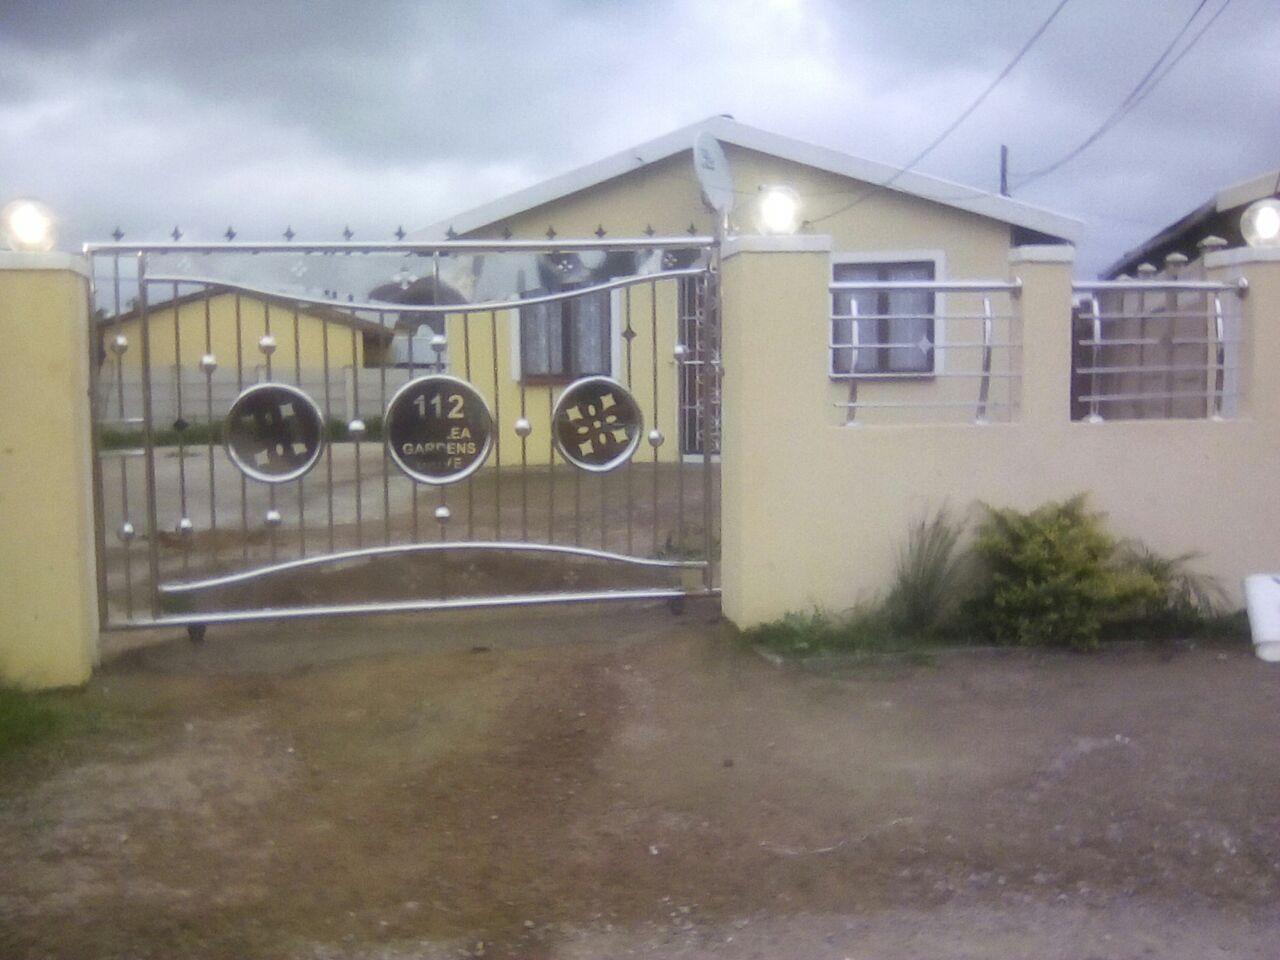 3 Bedroom House to rent In Wiggins